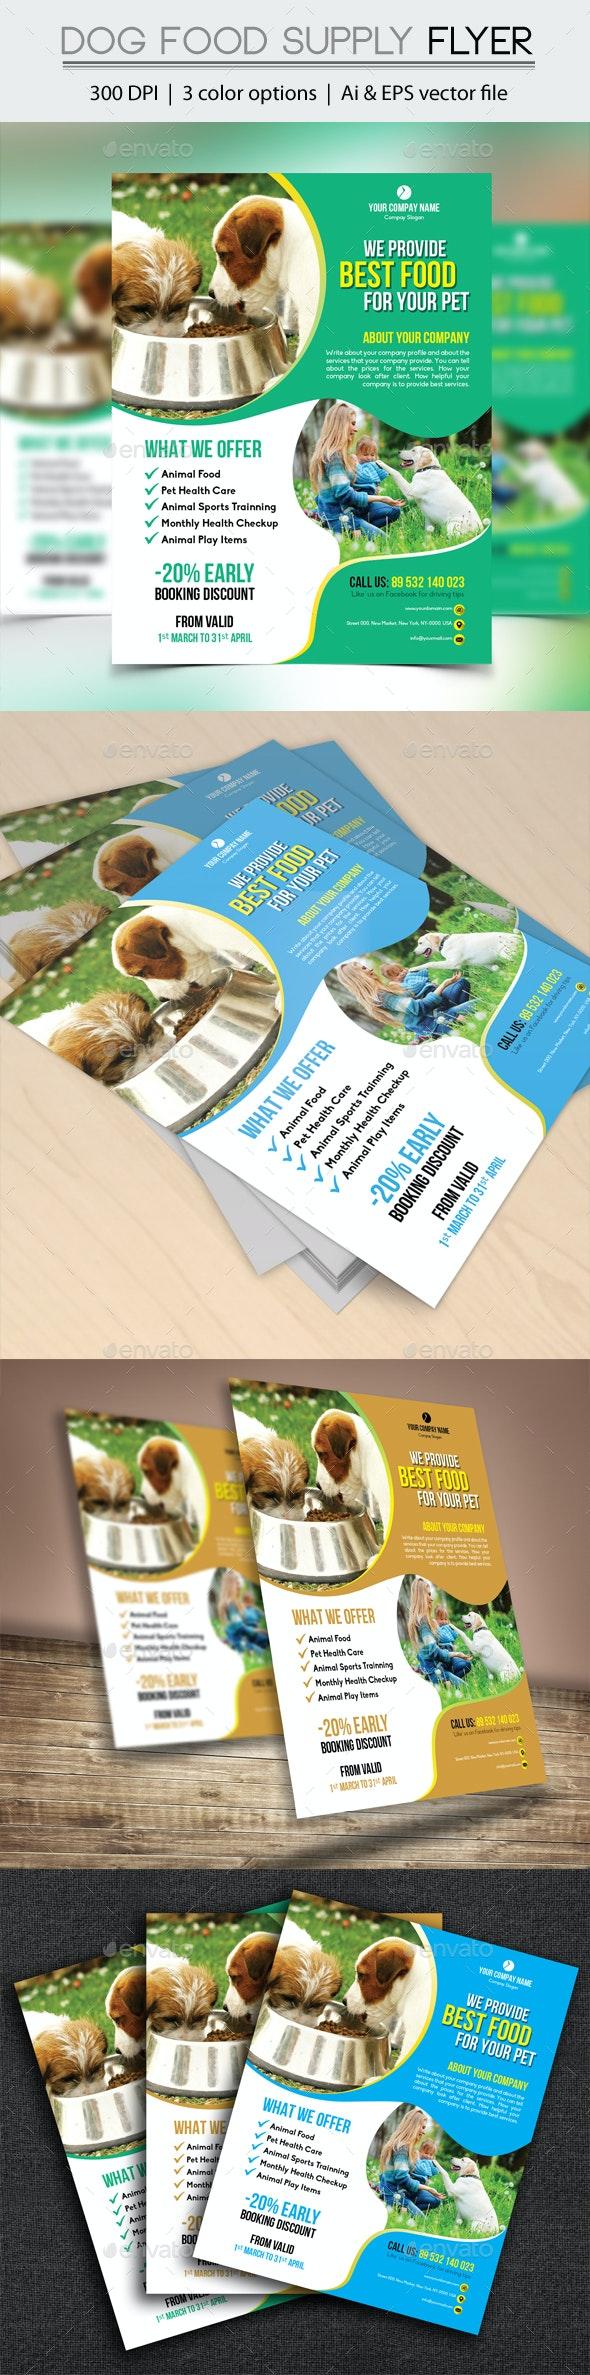 Dog Food Supply Flyer - Flyers Print Templates